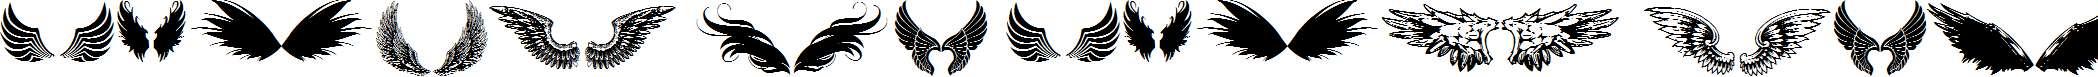 wings-of-wind-tfb